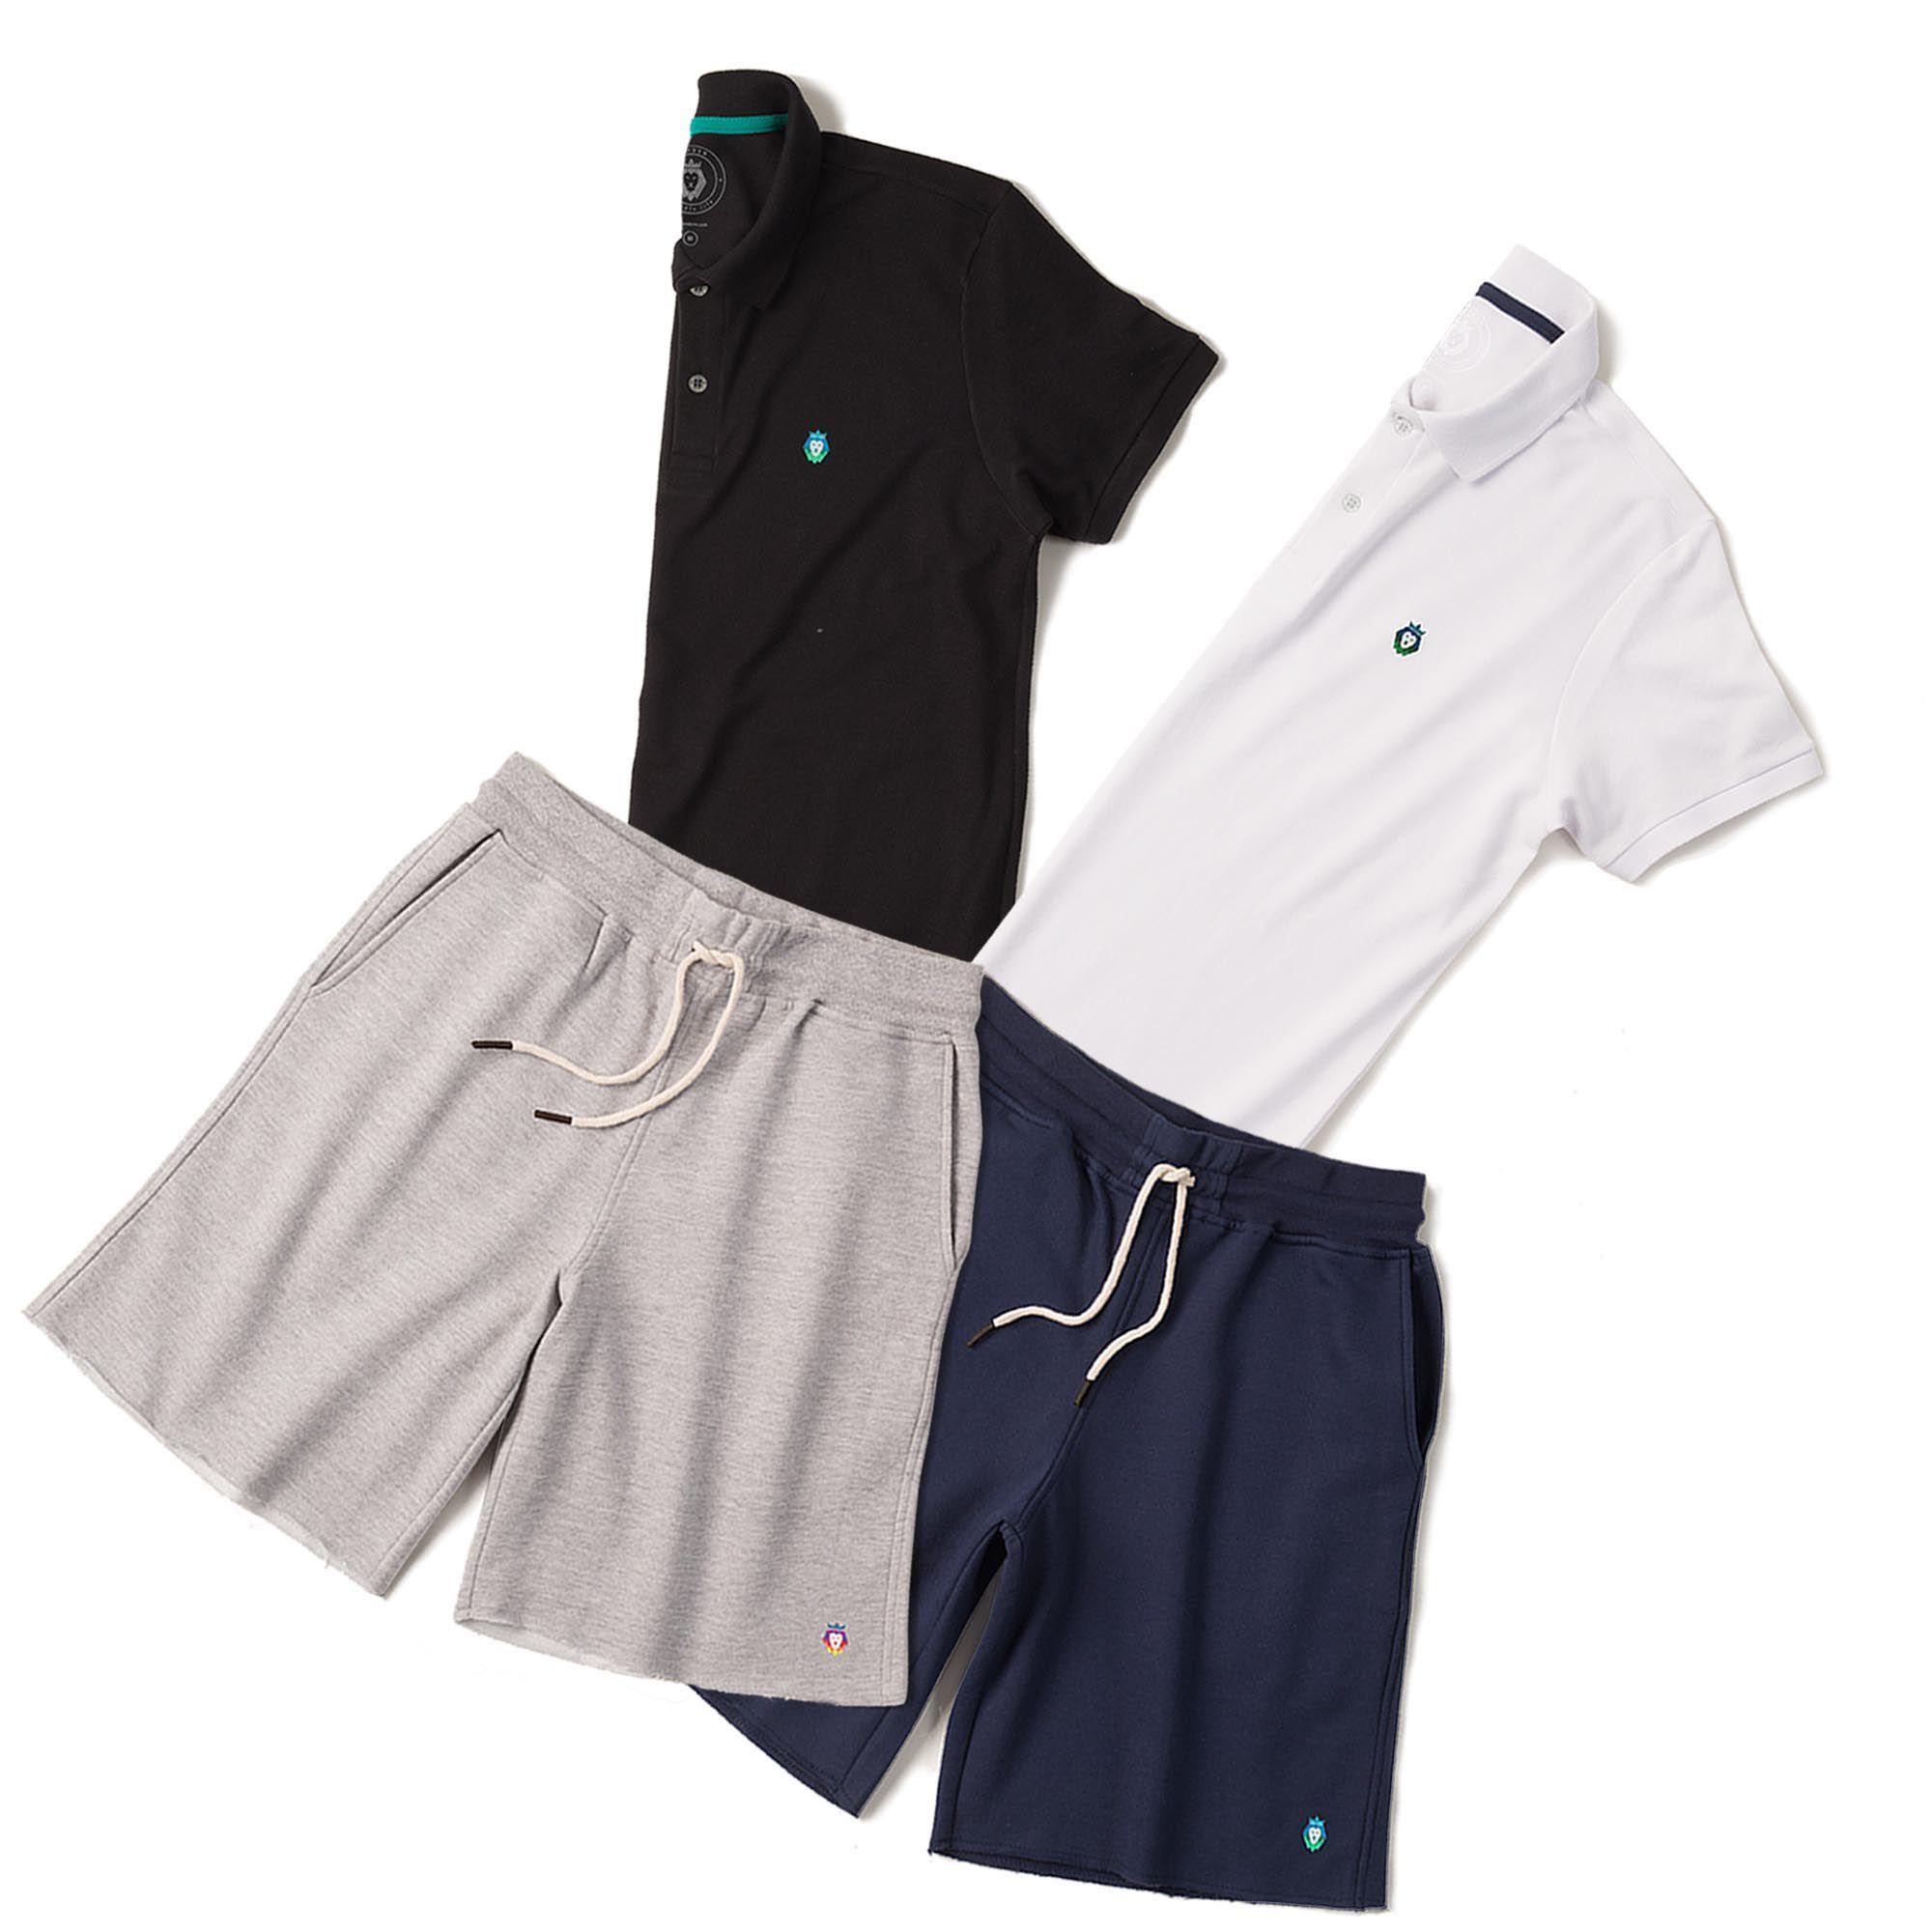 76e3173b4 Kit 2 Bermudas Basic Azul Marinho Mescla + 2 Camisas Polo Style Preta Branca  Zaiden Masculina ...